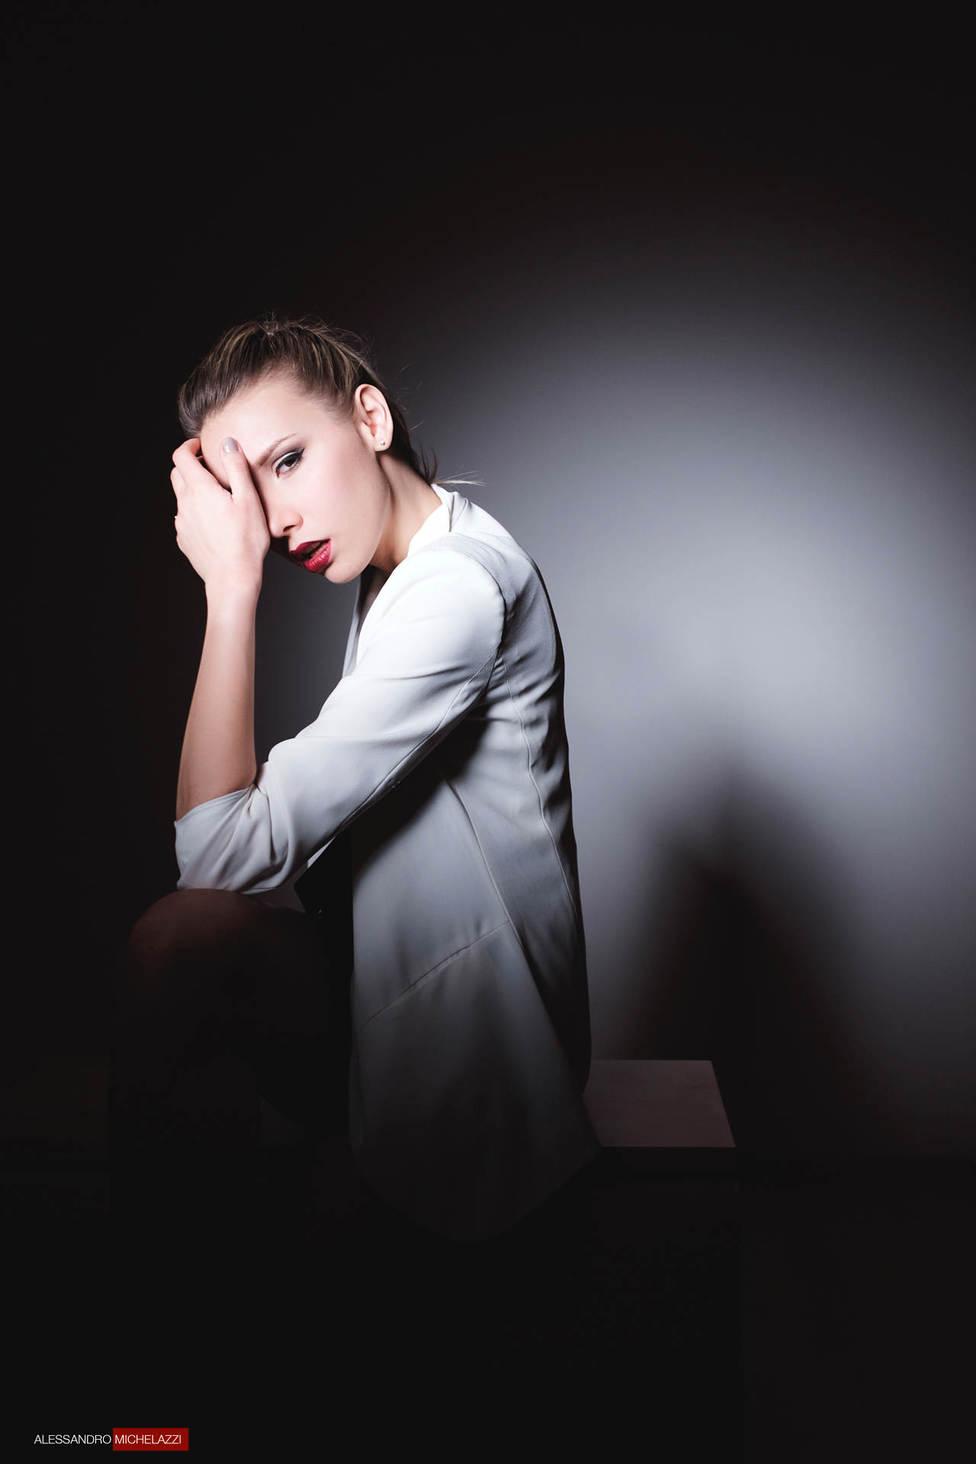 Alessandro-Michelazzi-Photography-X70-Fashion-Test-6